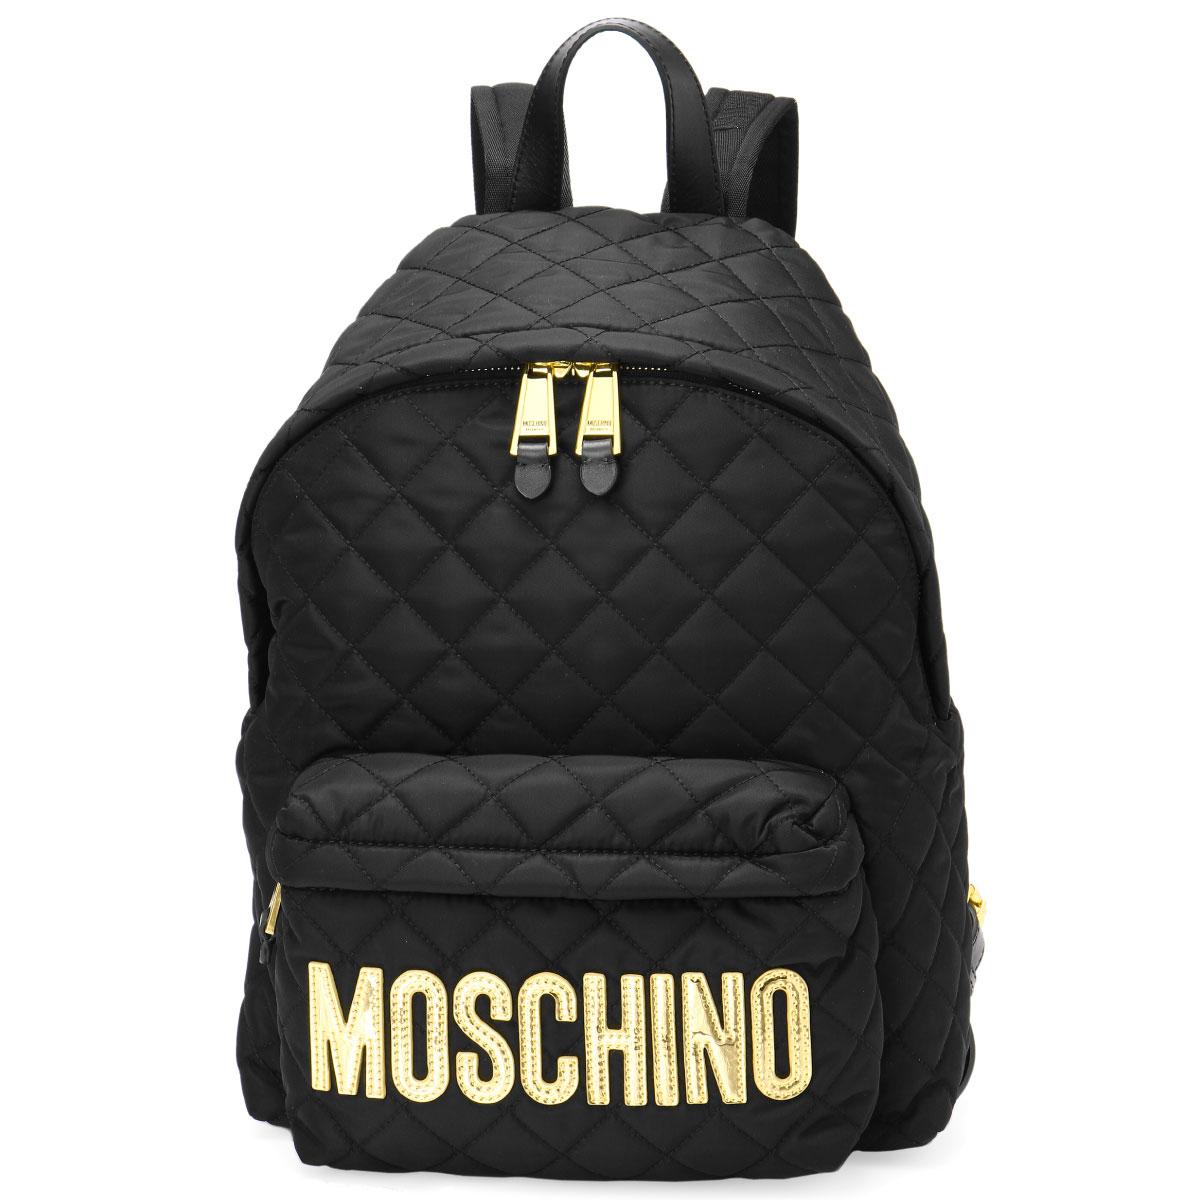 elegant shape terrific value select for latest Moschino MOSCHINO bag lady B7607 8201 2555 backpack BLACK black